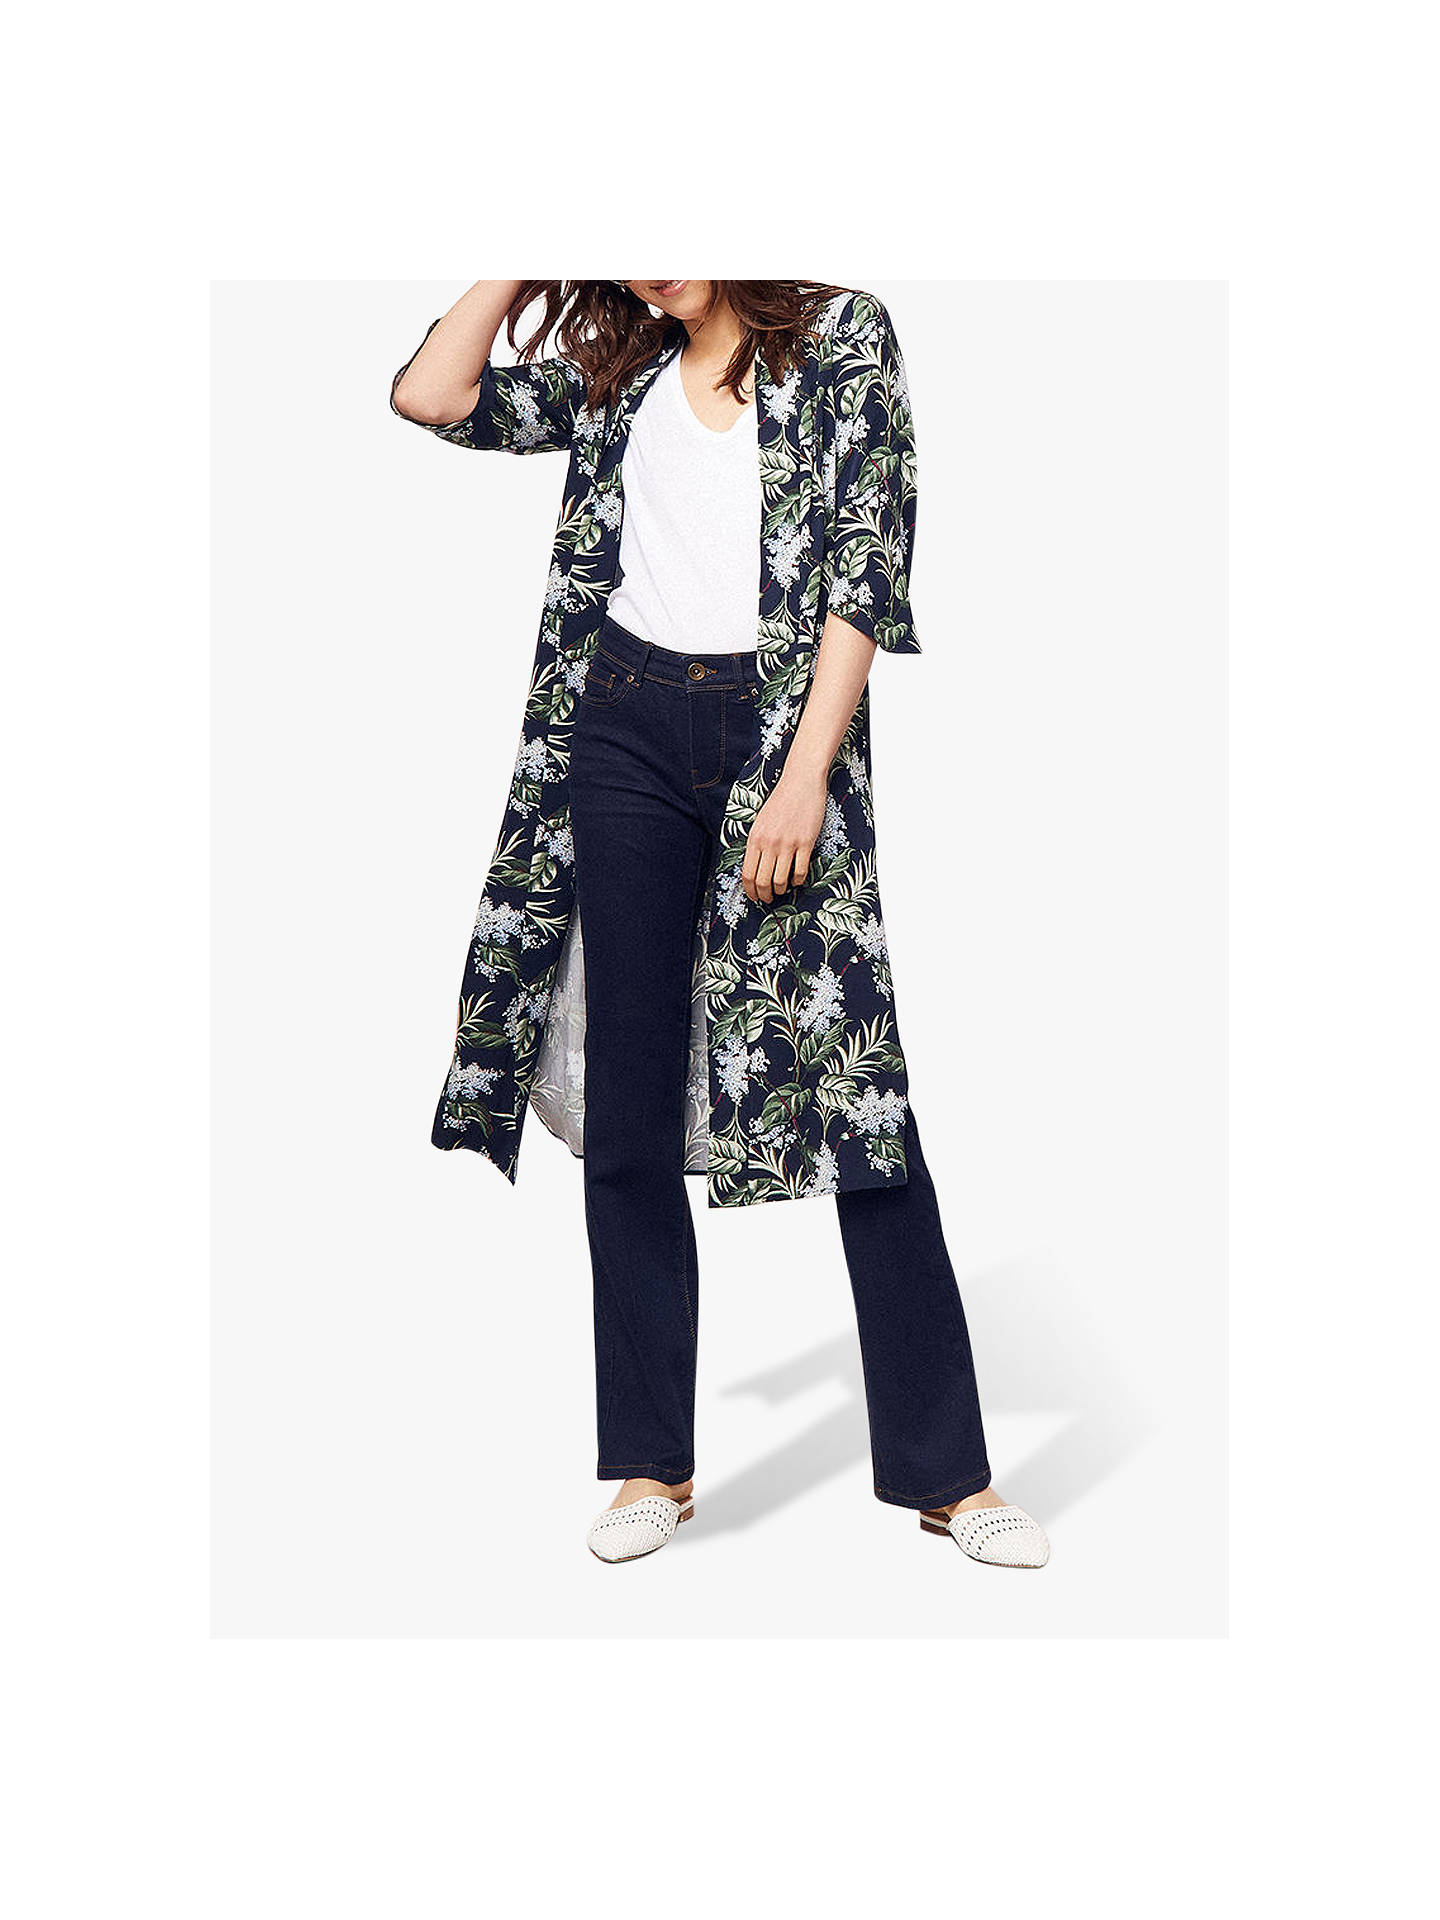 db098cc2f603 Buy Oasis Delray Kimono, Multi/Blue, 14 Online at johnlewis.com ...